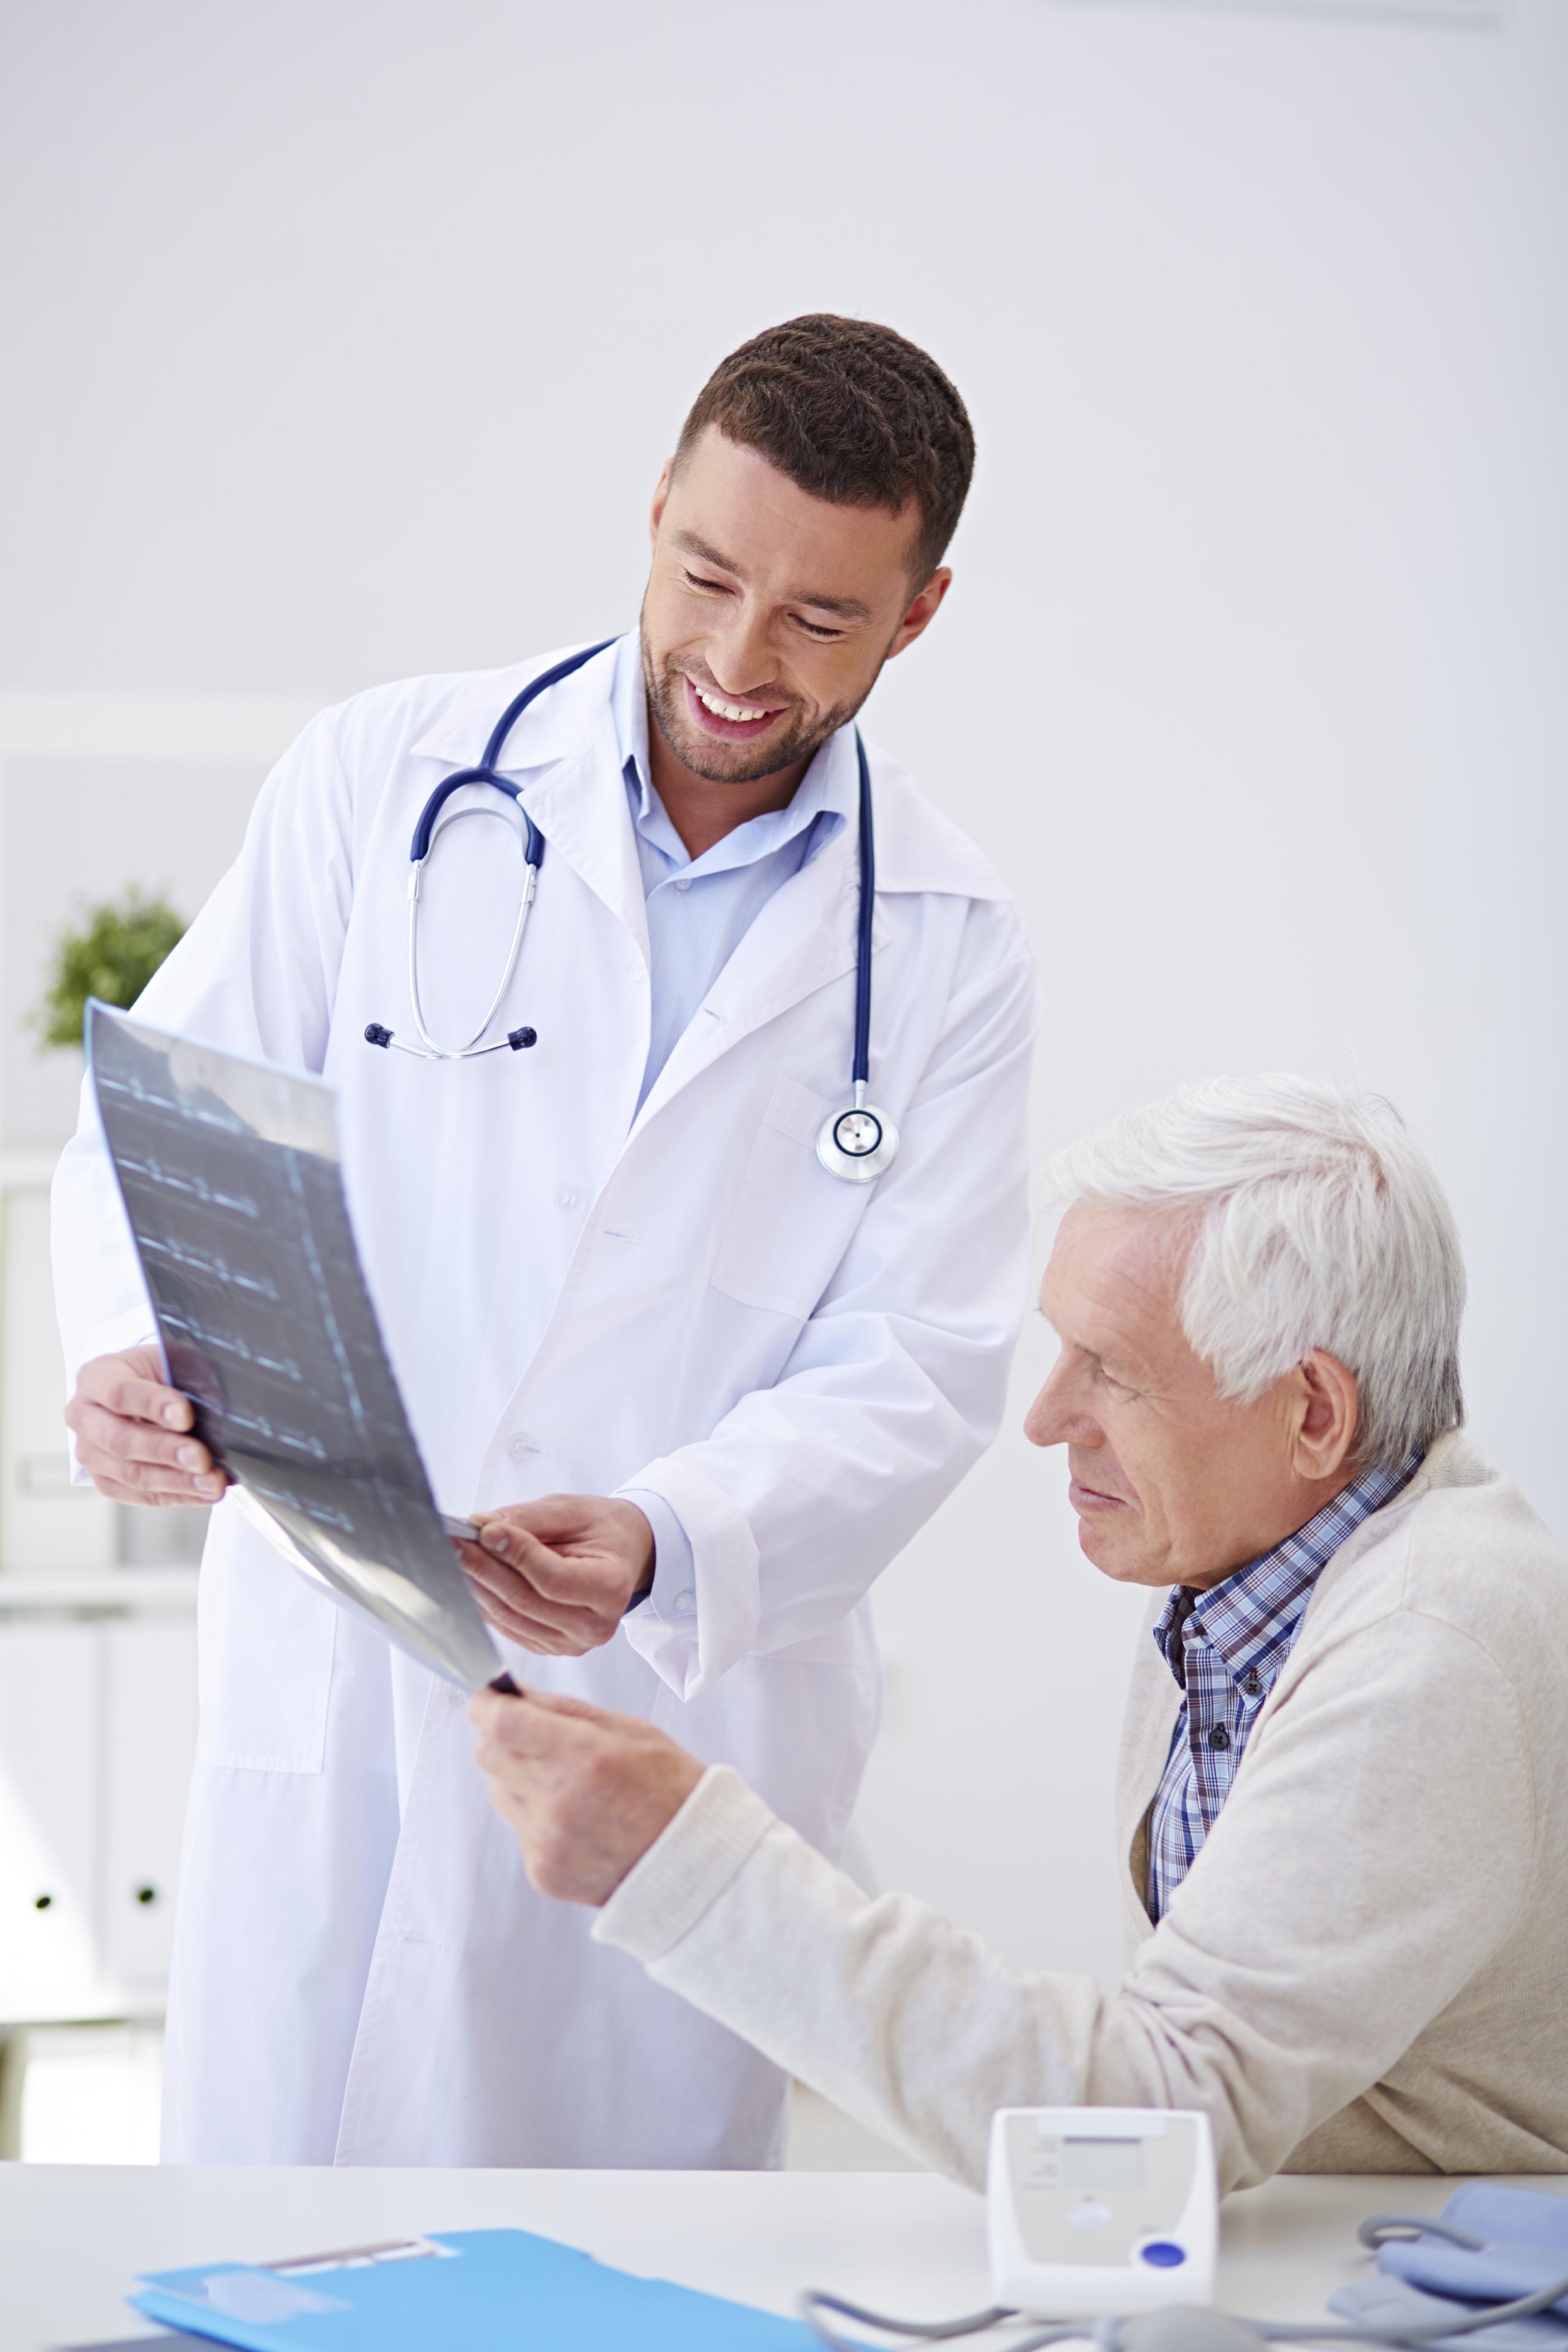 emedical medical checkups, boss magazine